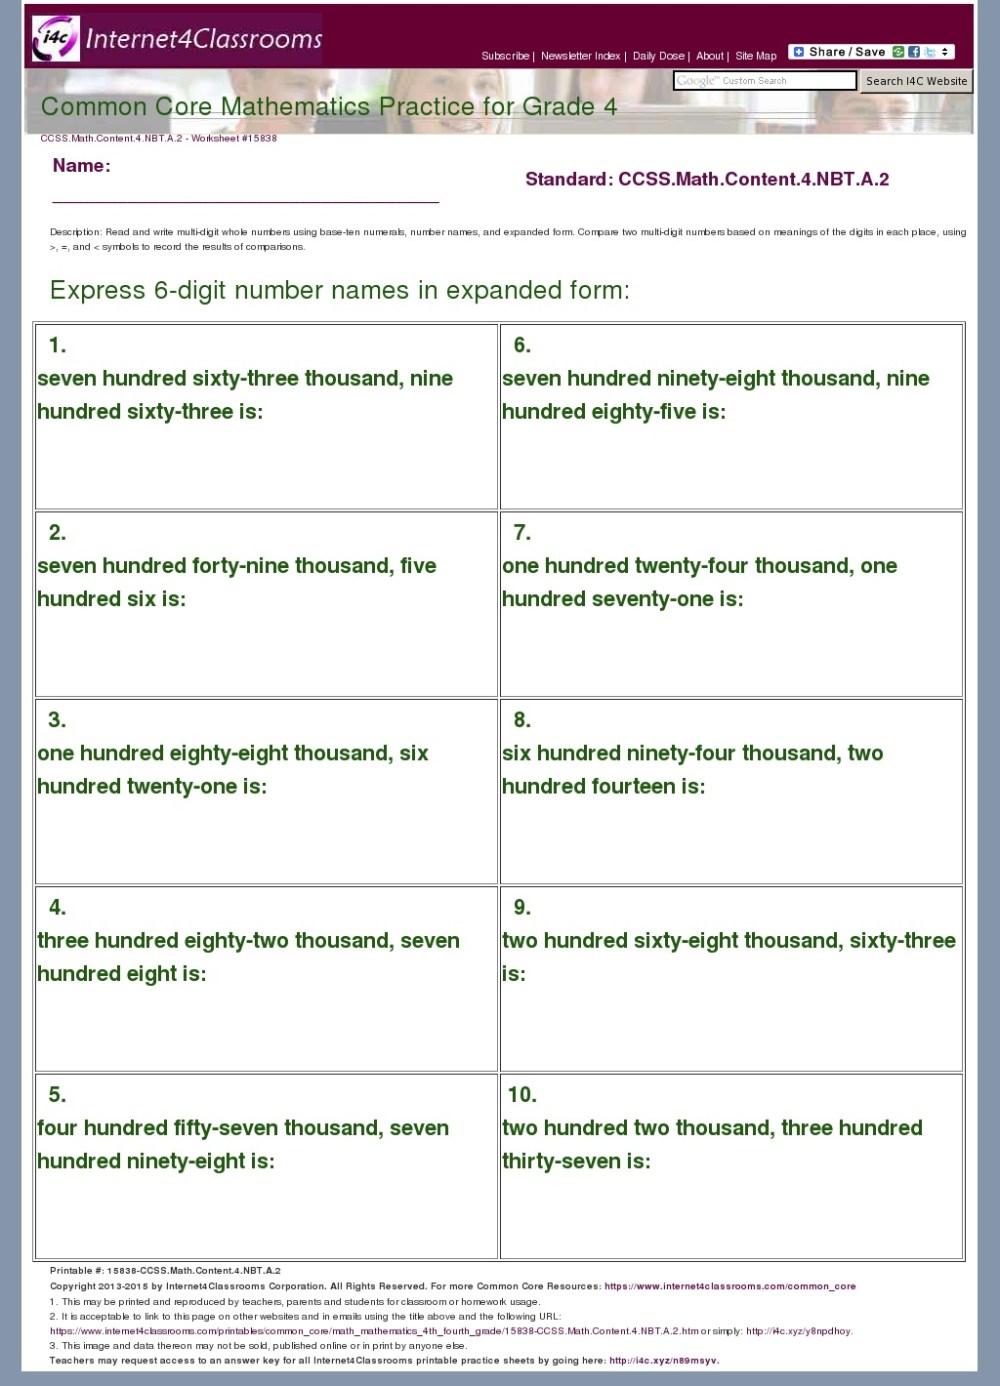 medium resolution of Description/Download - Worksheet #15838. CCSS.Math.Content.4.NBT.A.2